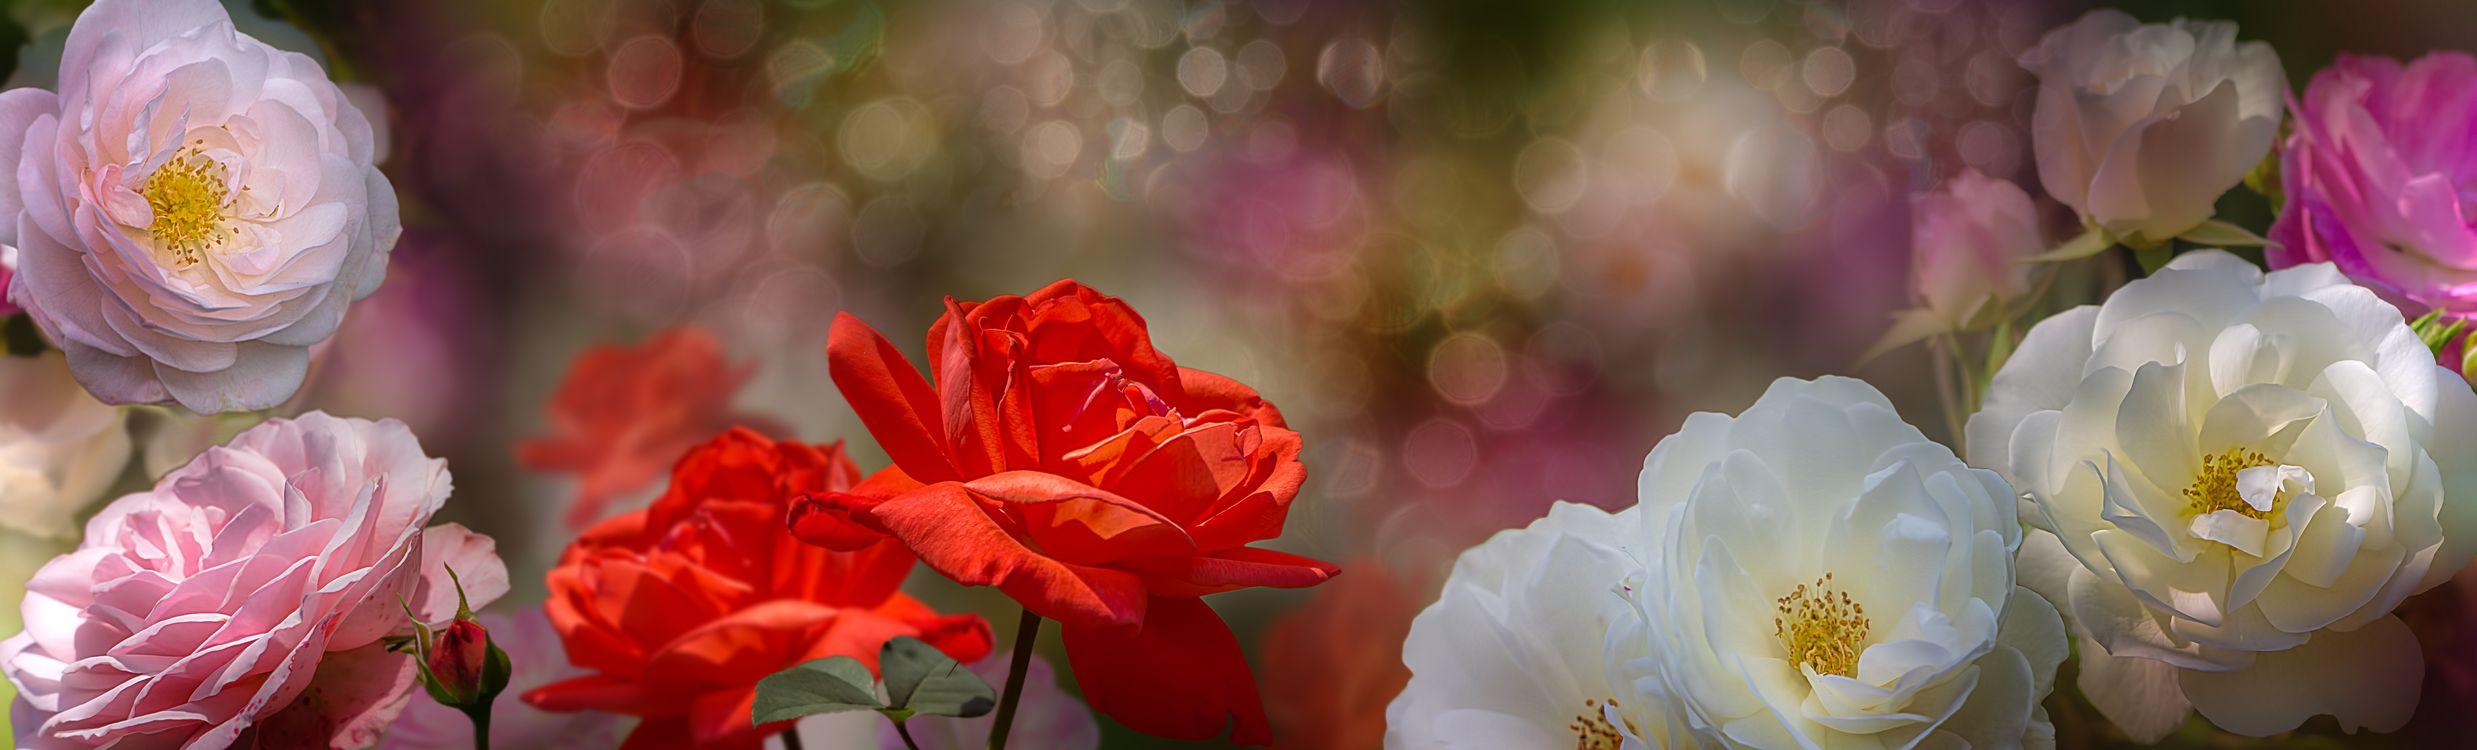 Фото бесплатно панорама, флора, роза - на рабочий стол